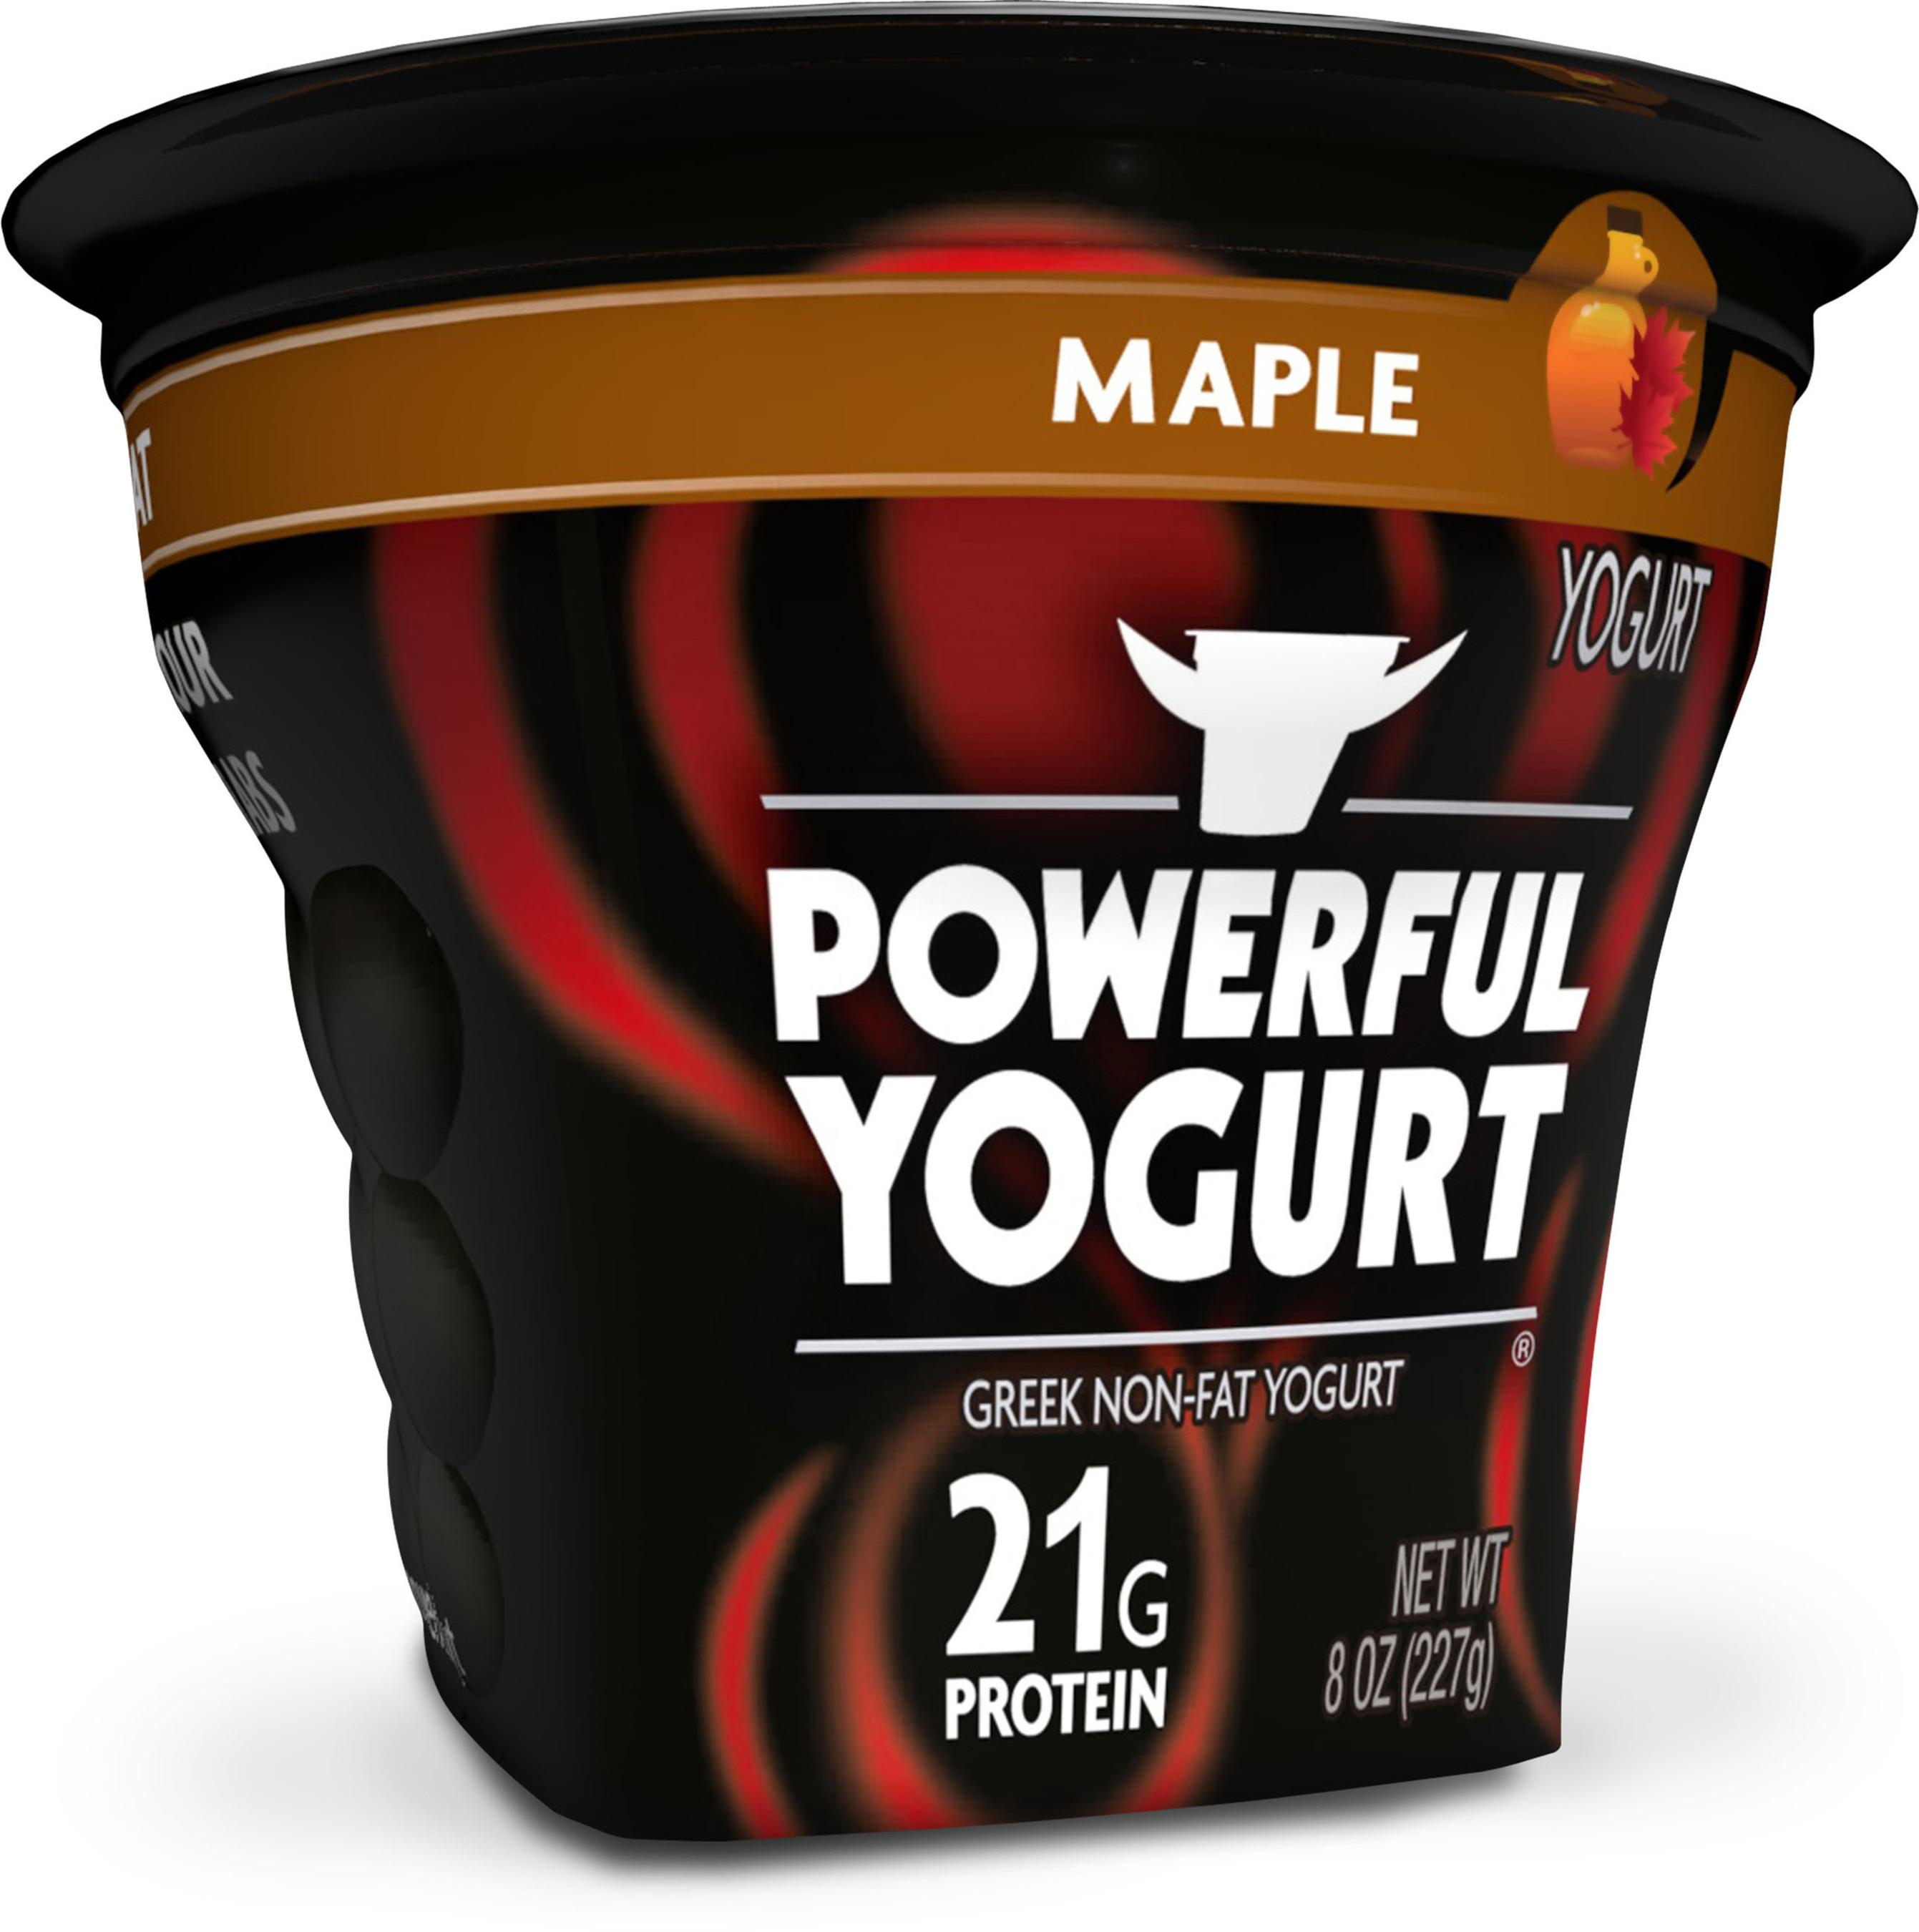 Maple Powerful Yogurt image.(PRNewsFoto/Powerful Yogurt)